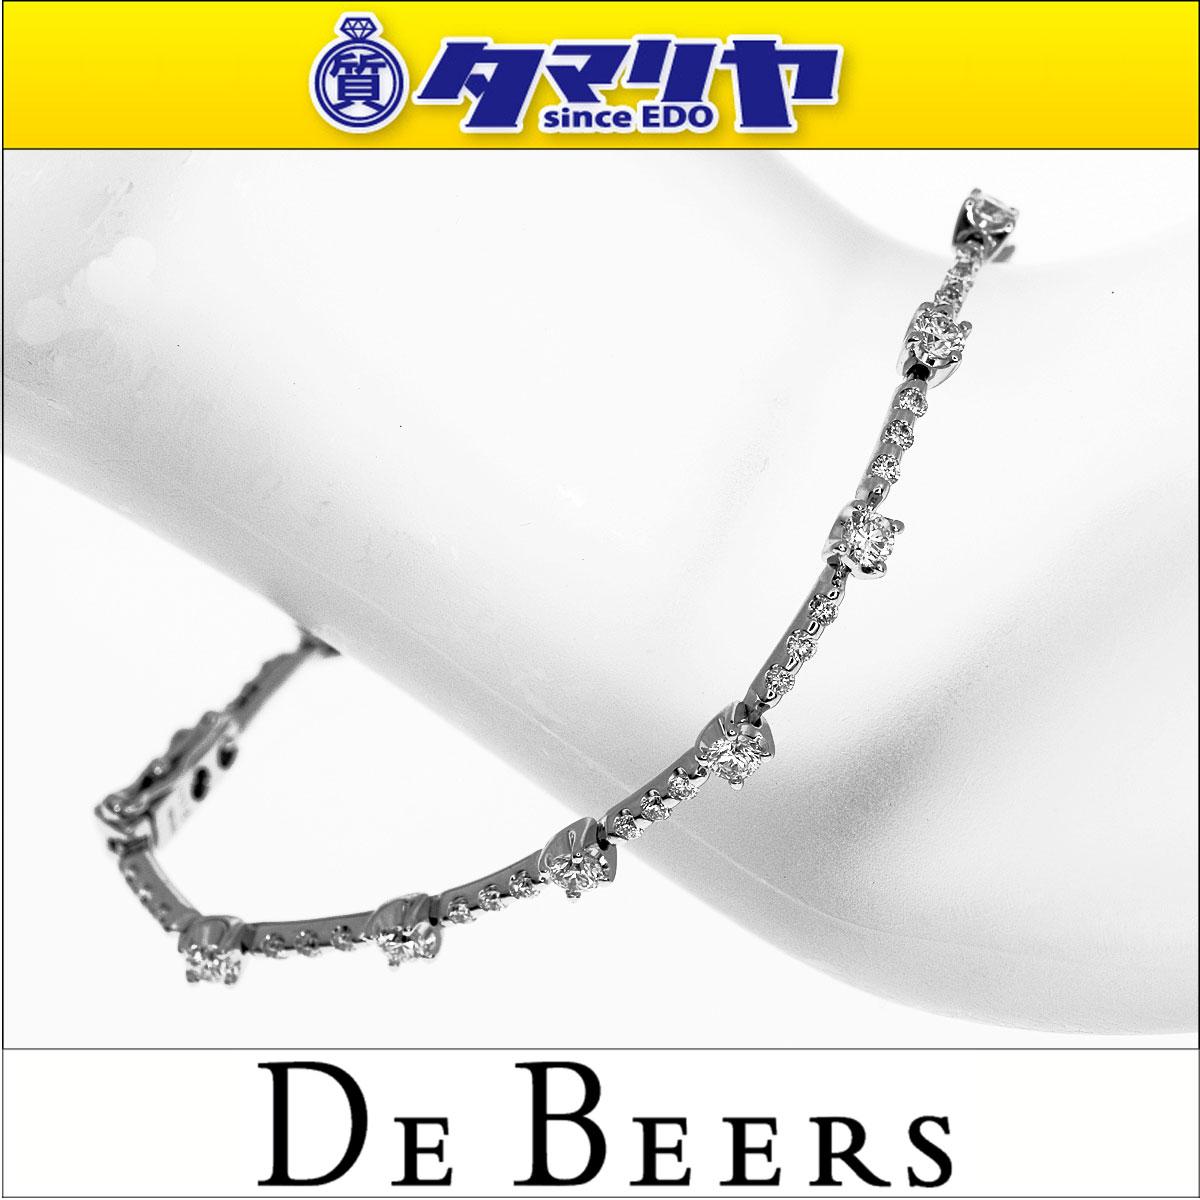 d9ac0868411a ... gucci | De Beers デ ビアス ダイヤ(D2.00ct) Line ライン ブレスレット 16cm 750 K18 WG  ホワイトゴールド 鑑別書 | 送料無料 | き手数料無料 | レディース ...